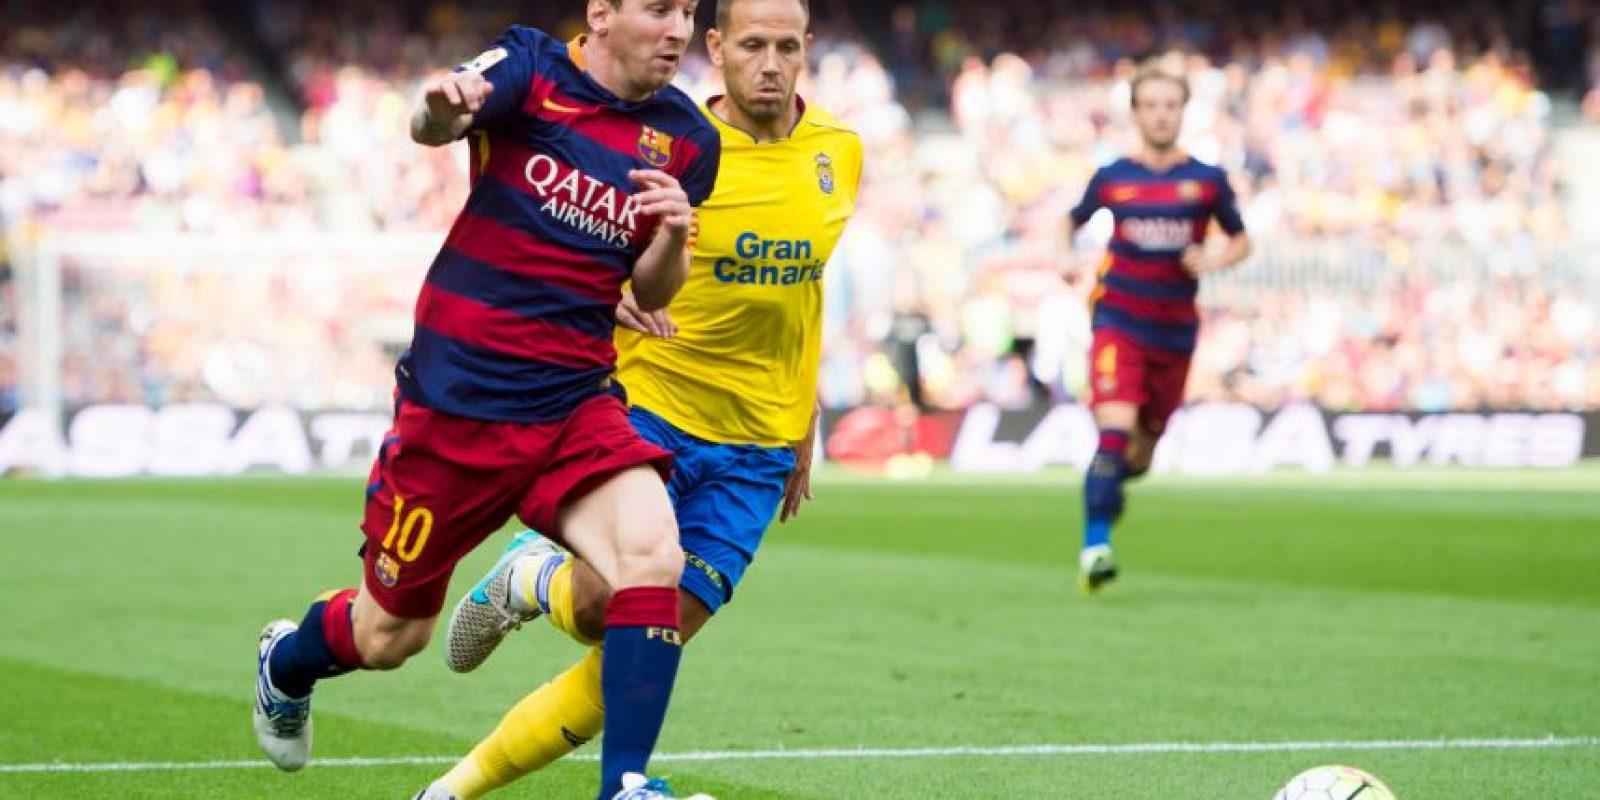 Tres Copas del Rey Foto:Getty Images